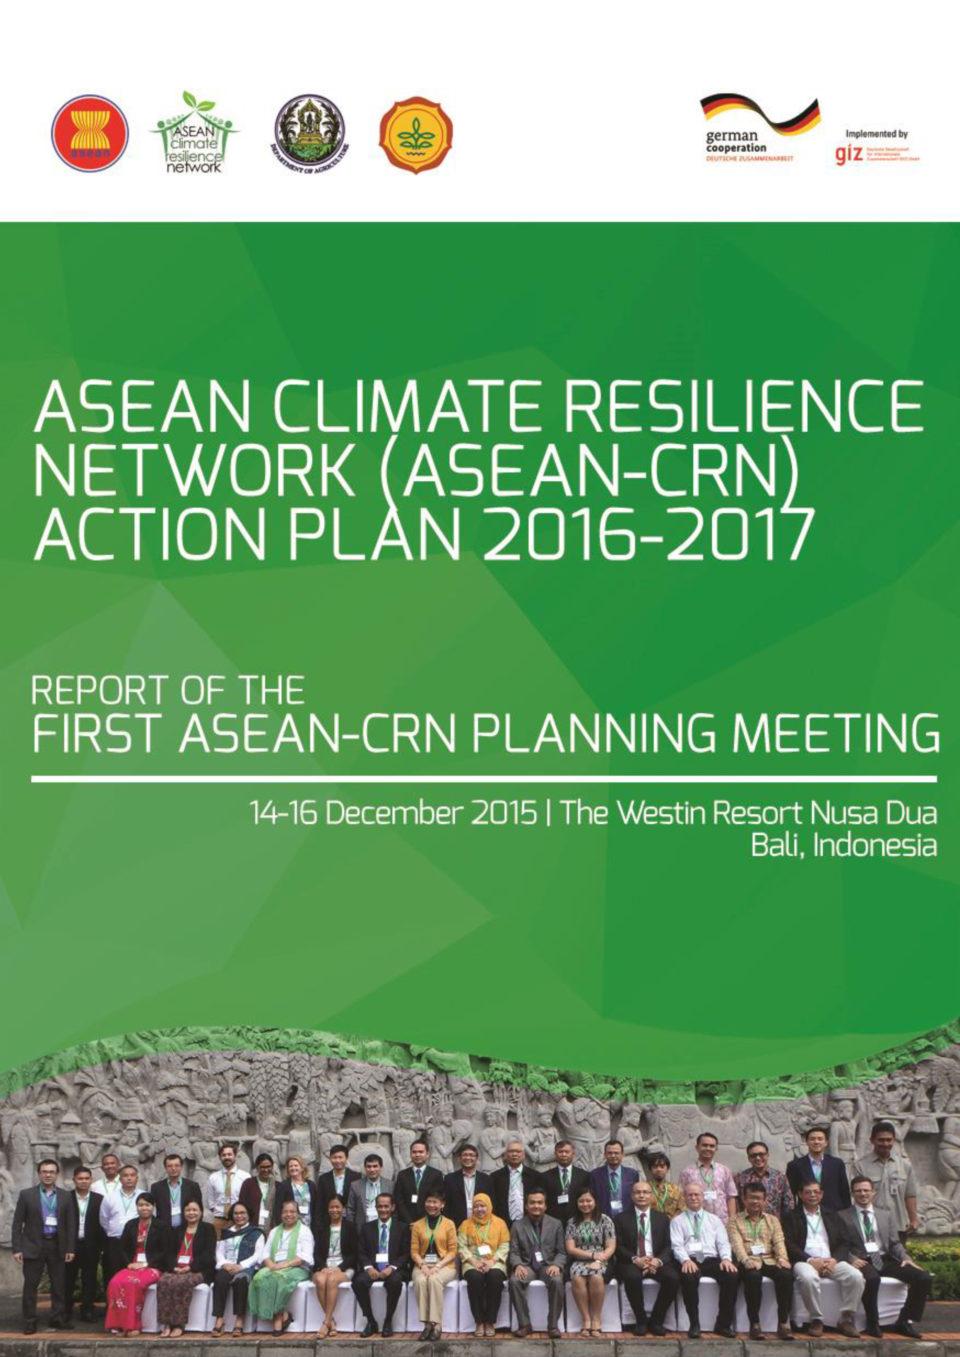 ASEAN-CRN Action Plan 2016-2017